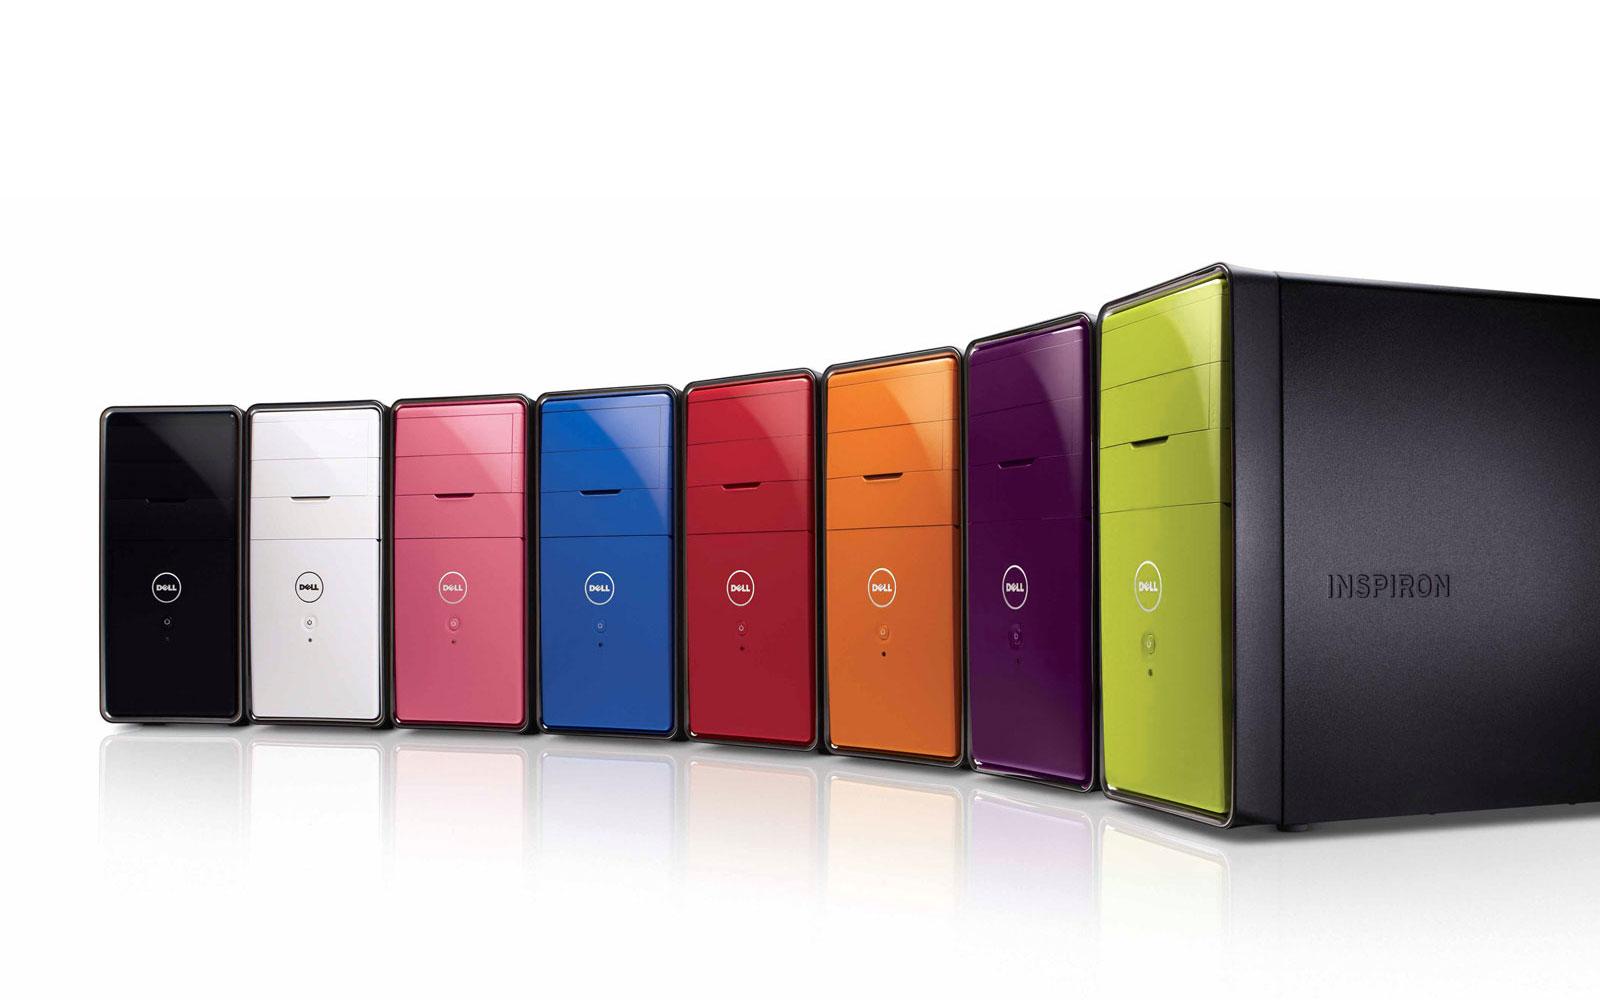 DELL INSPIRON 500 - Desktop Computer